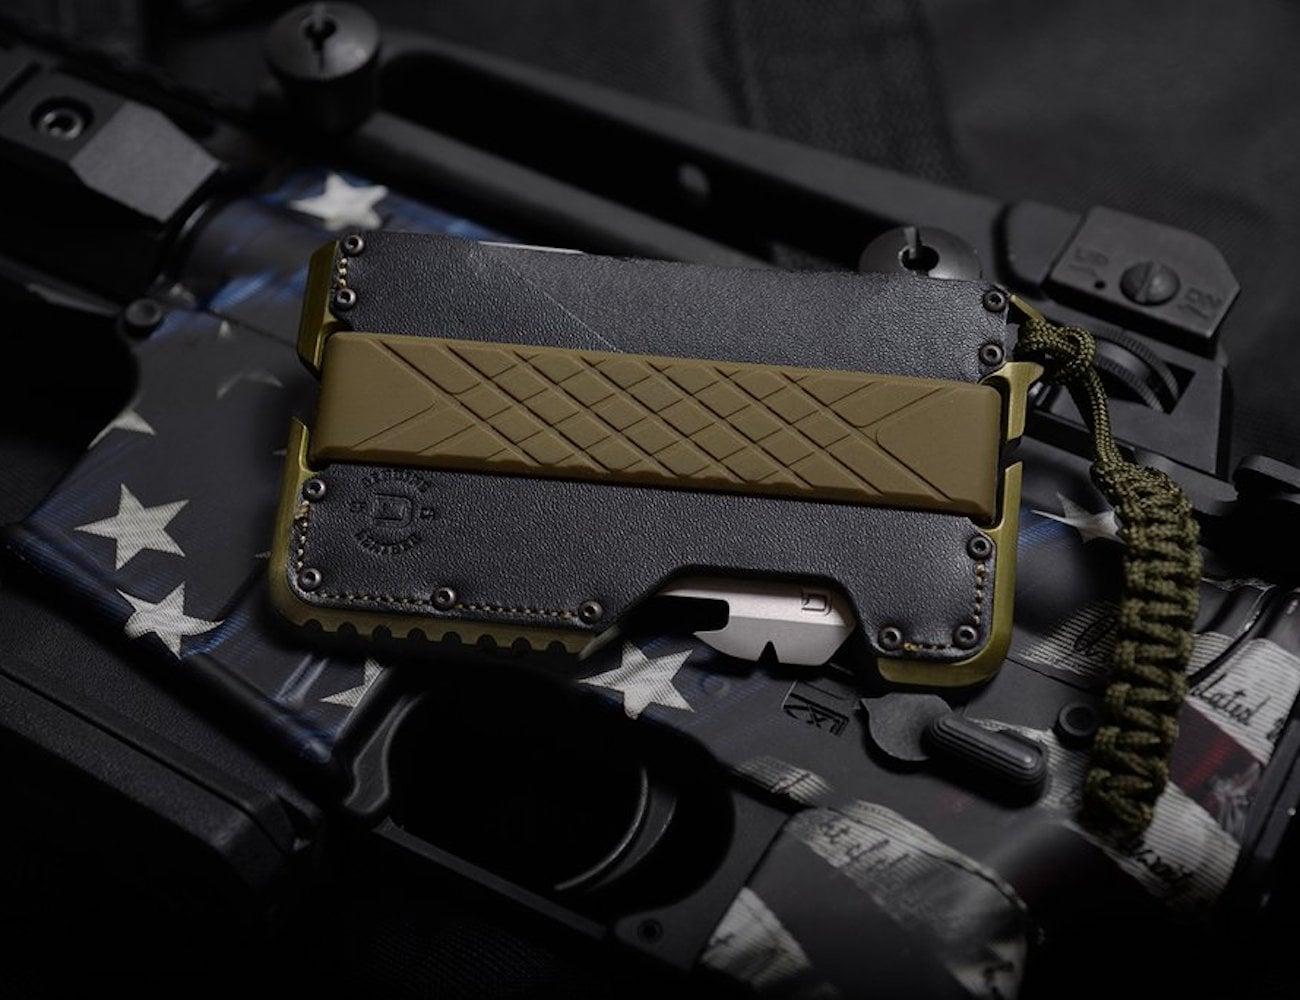 Dango EDC Wallet: Your Wallet and Tools Combination